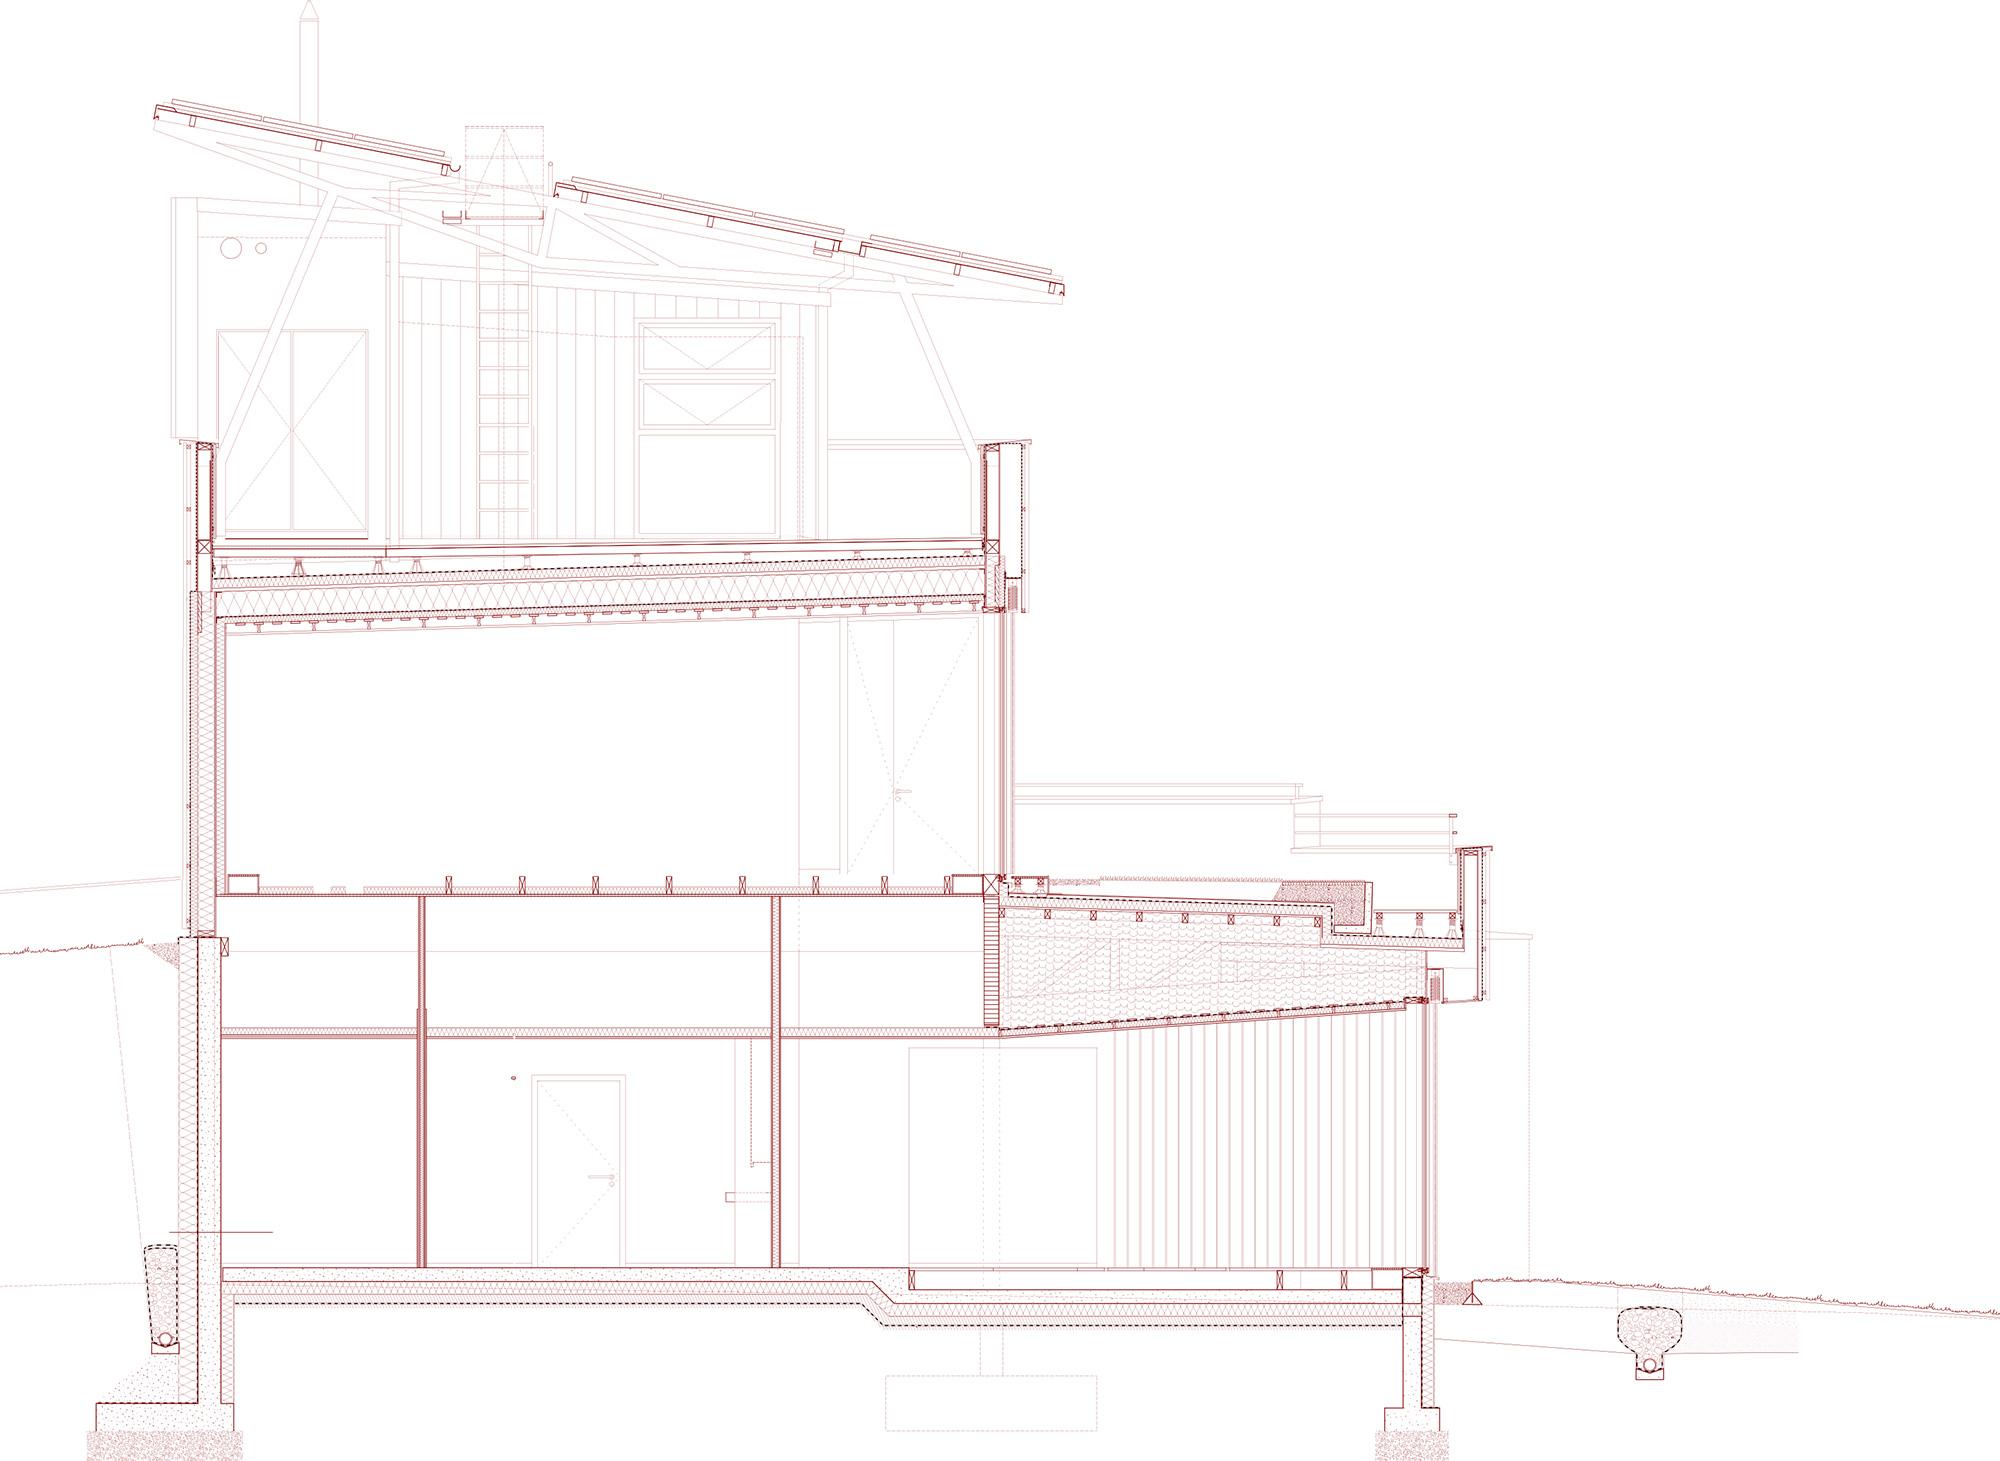 maison des nergies h ricourt ixo architecture. Black Bedroom Furniture Sets. Home Design Ideas